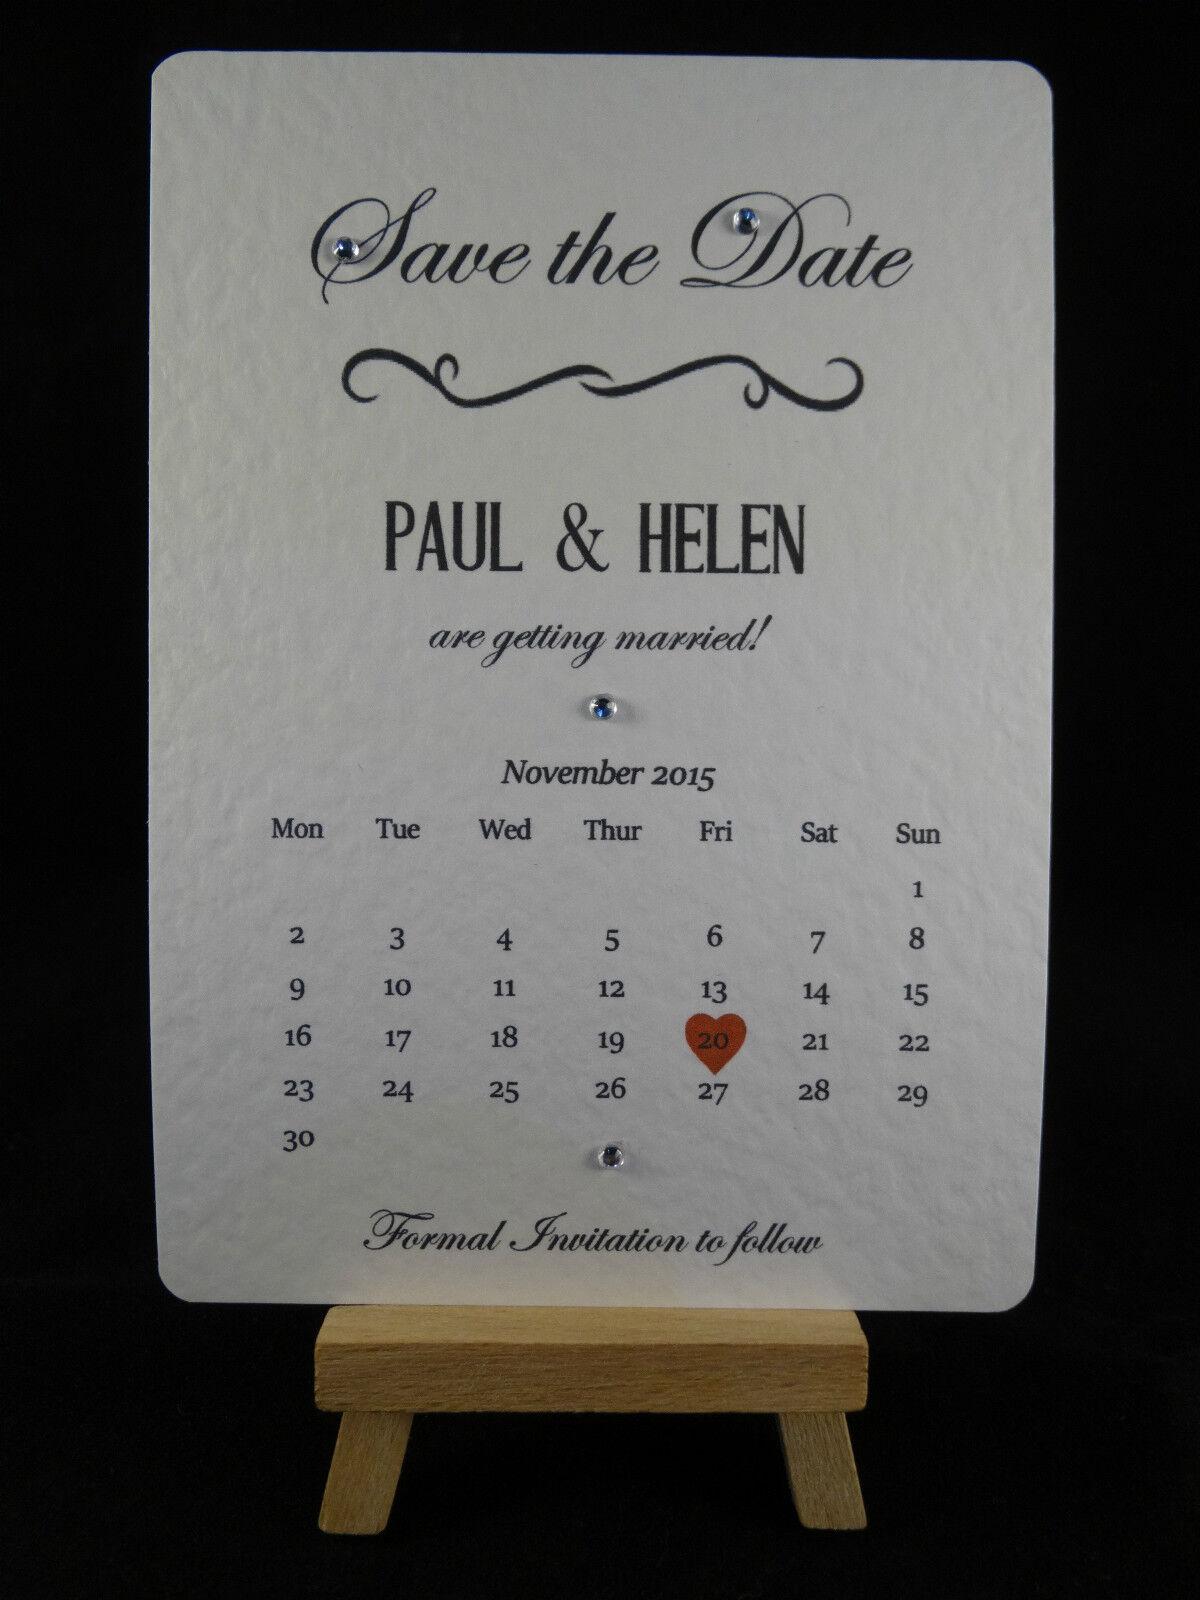 Personalised Handmade Magnet Calendar Wedding Save the Dates Rustic Vintage